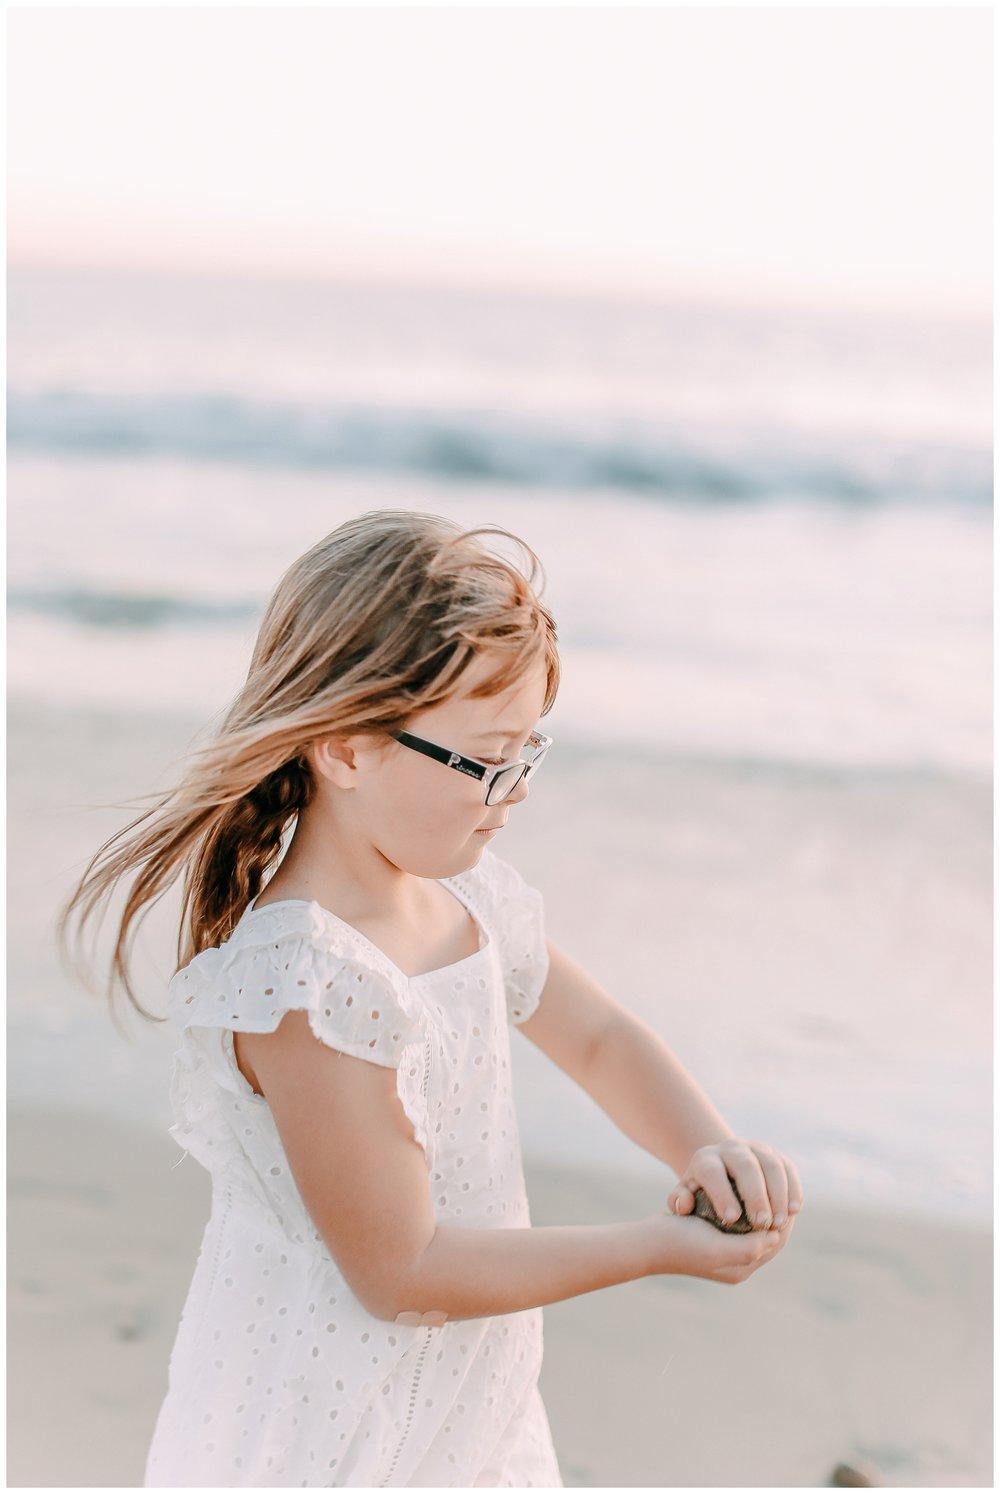 San_clemente_family_session_Orange_county_family_photographer_cori_kleckner_photography_laguna_beach_family_session_0708.jpg